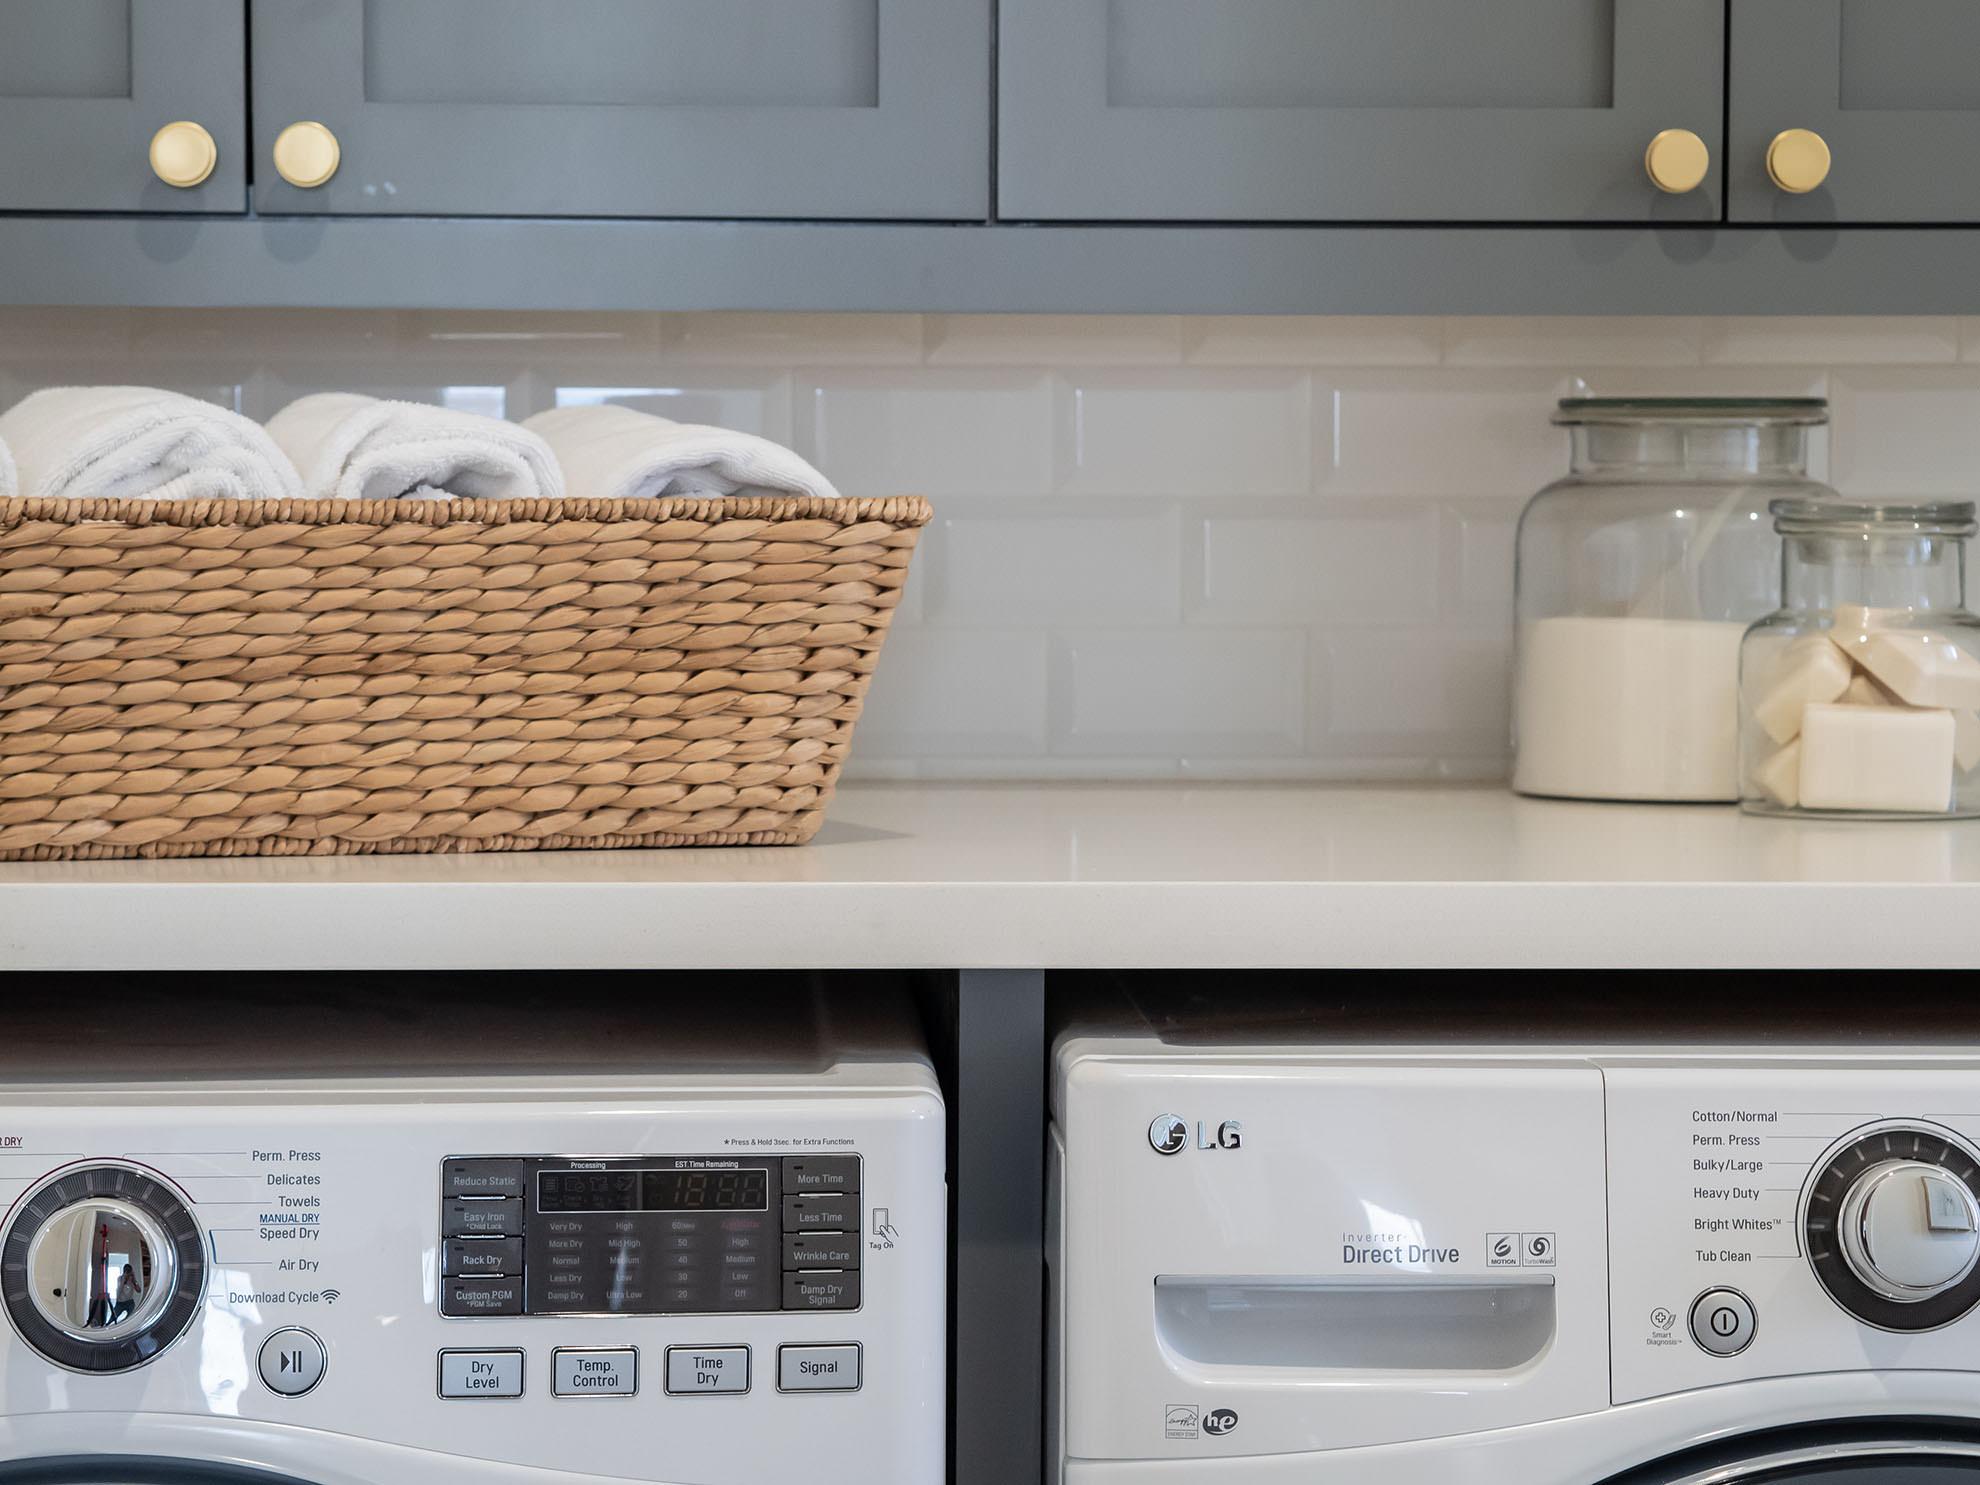 tnd-laundry-1010108.jpg